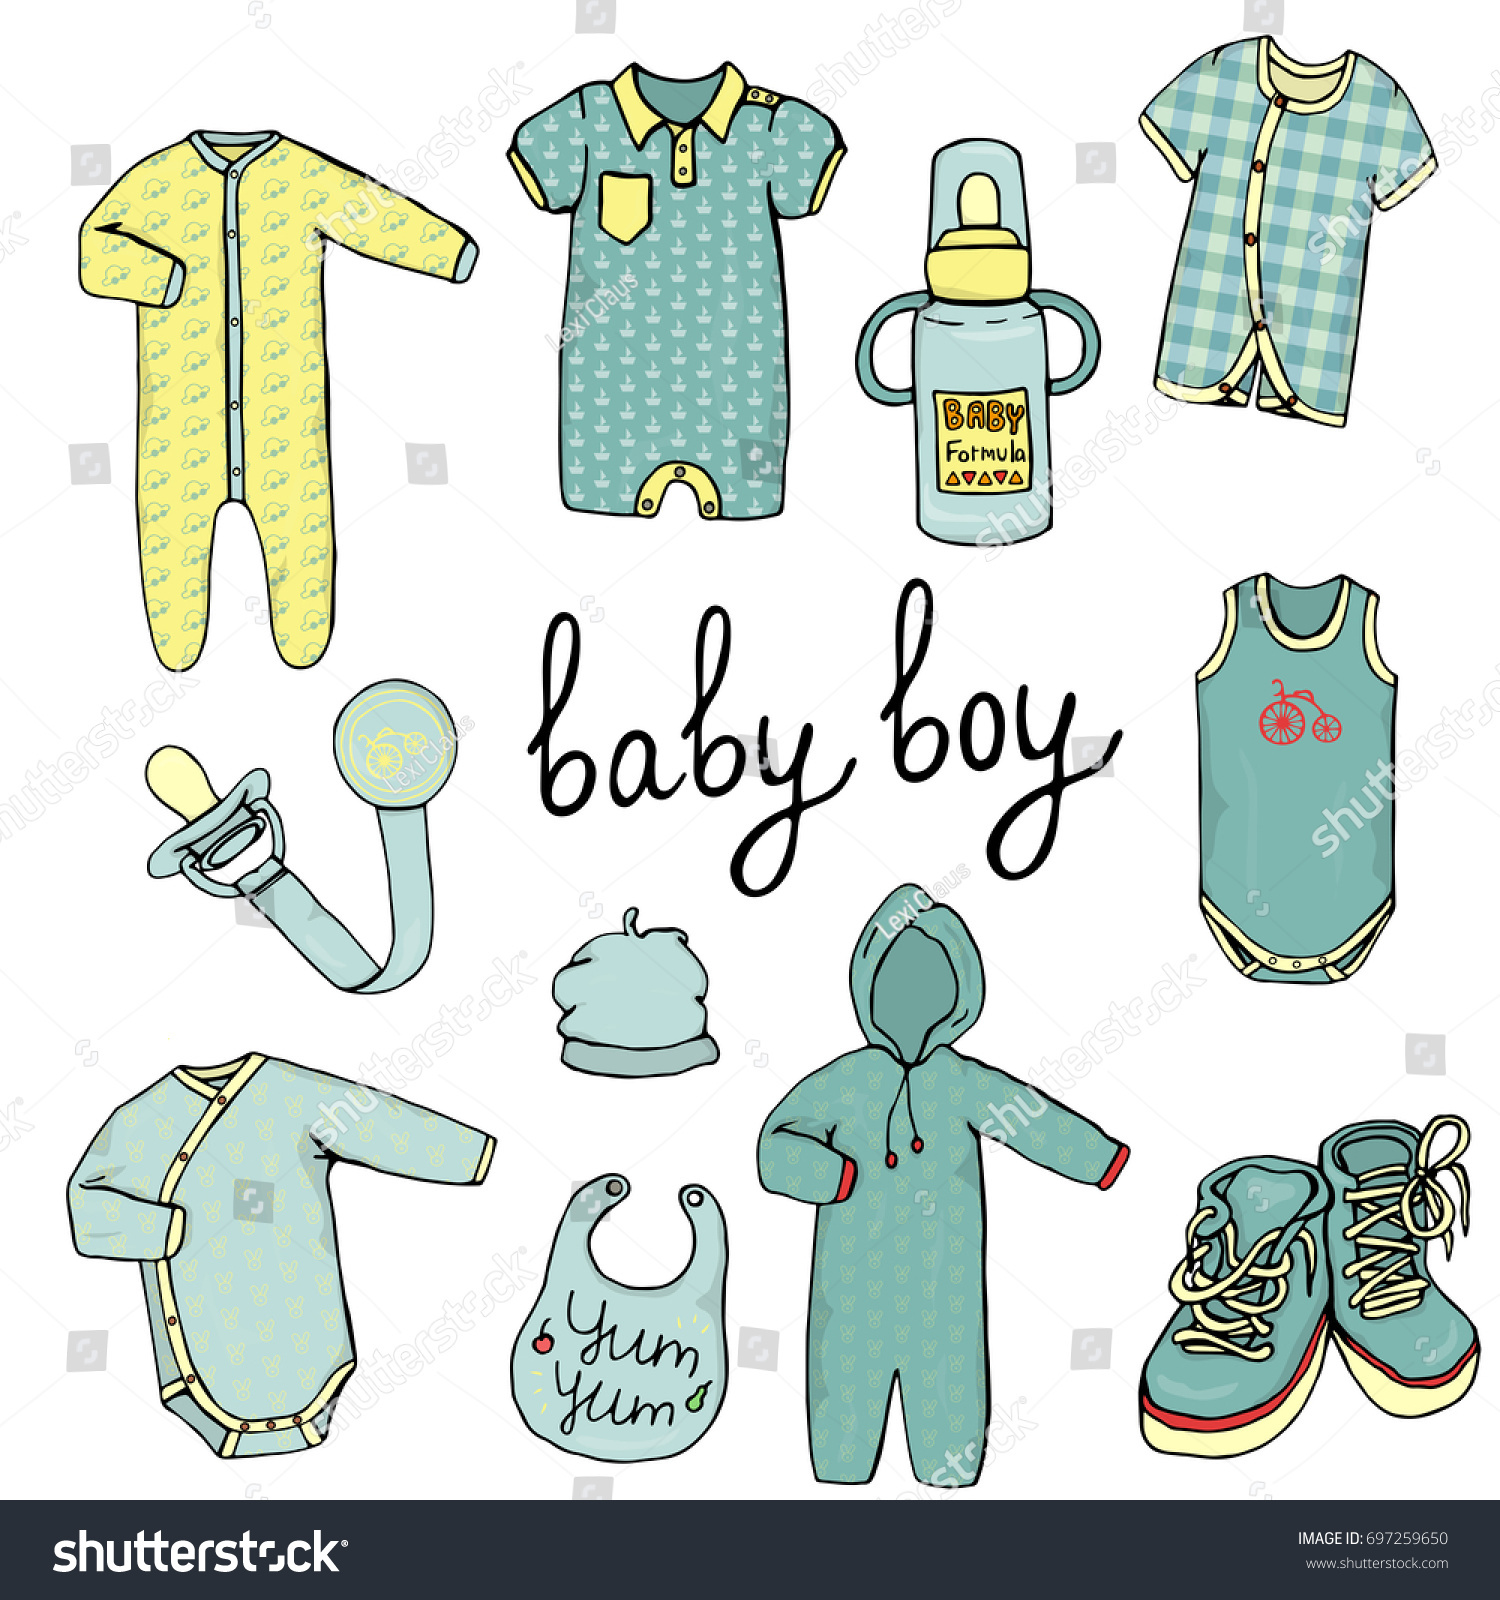 Vector Illustration Baby Clothes Baby Boy Stock Vector